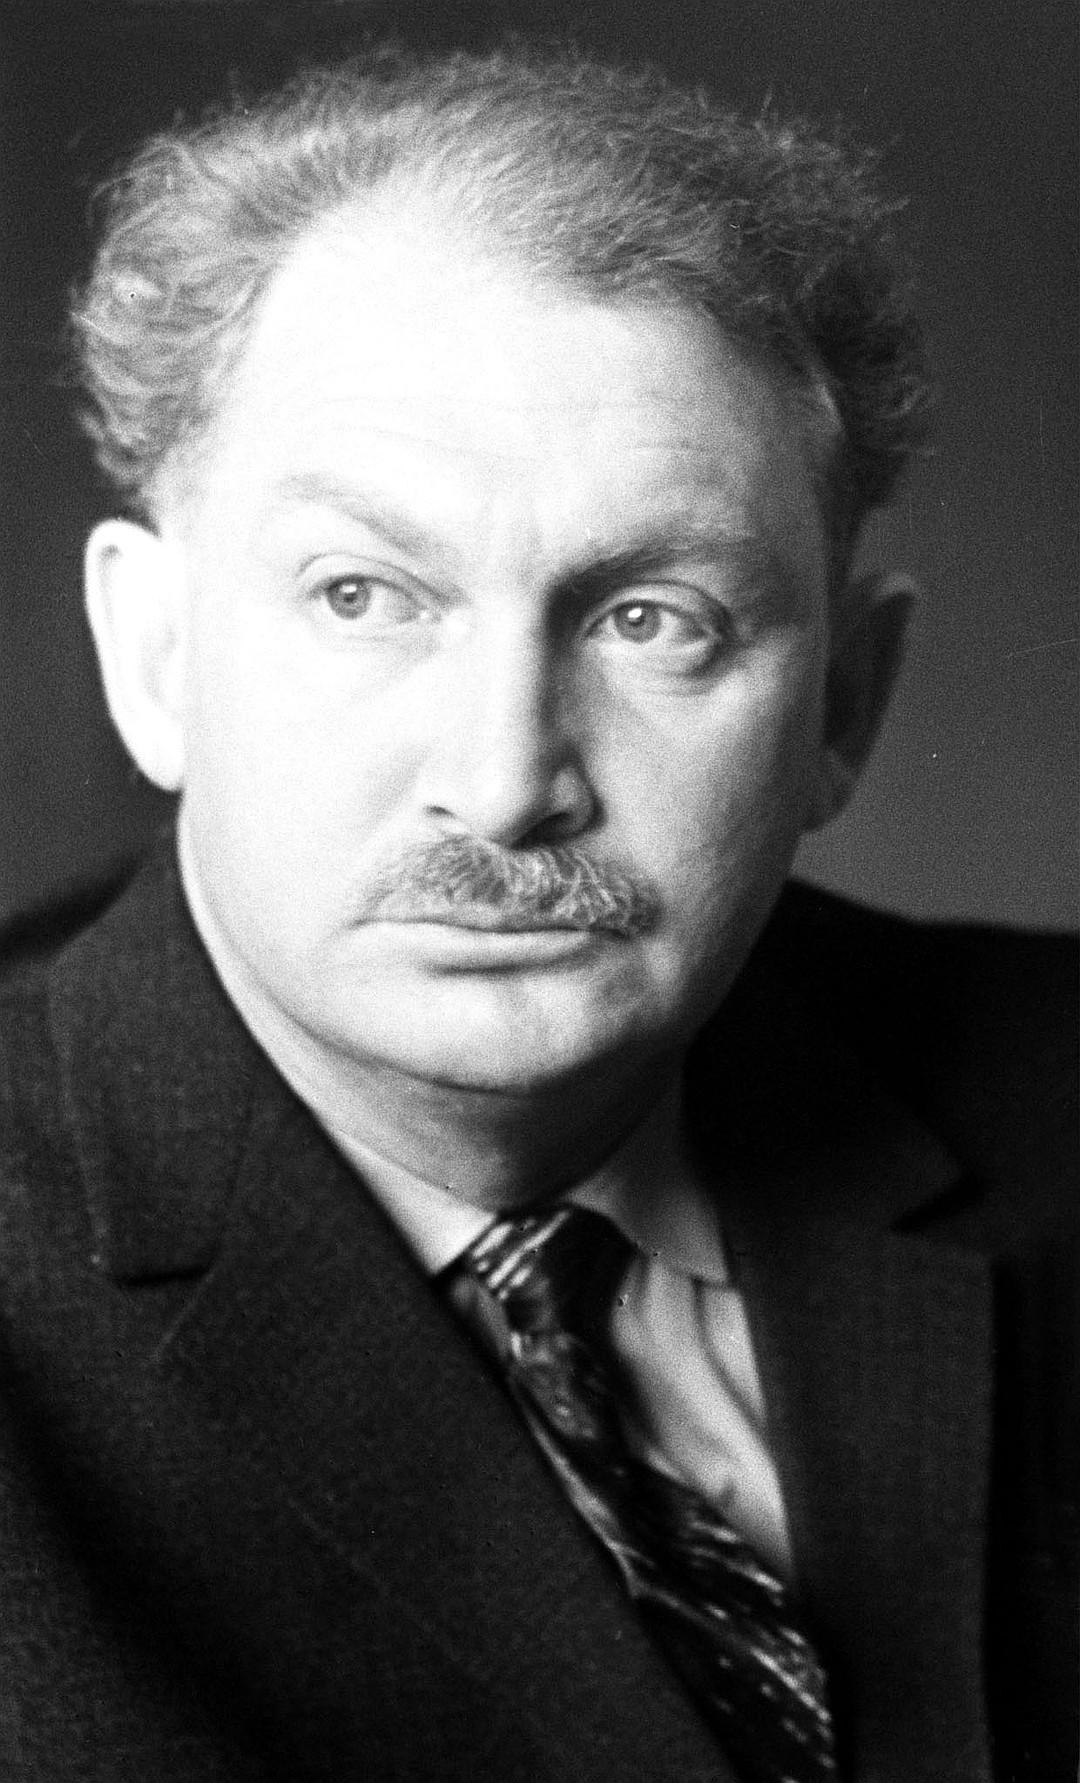 Советский поэт Борис Слуцкий, 1963 г. Фото А.Лесса /Фотохроника ТАСС/.